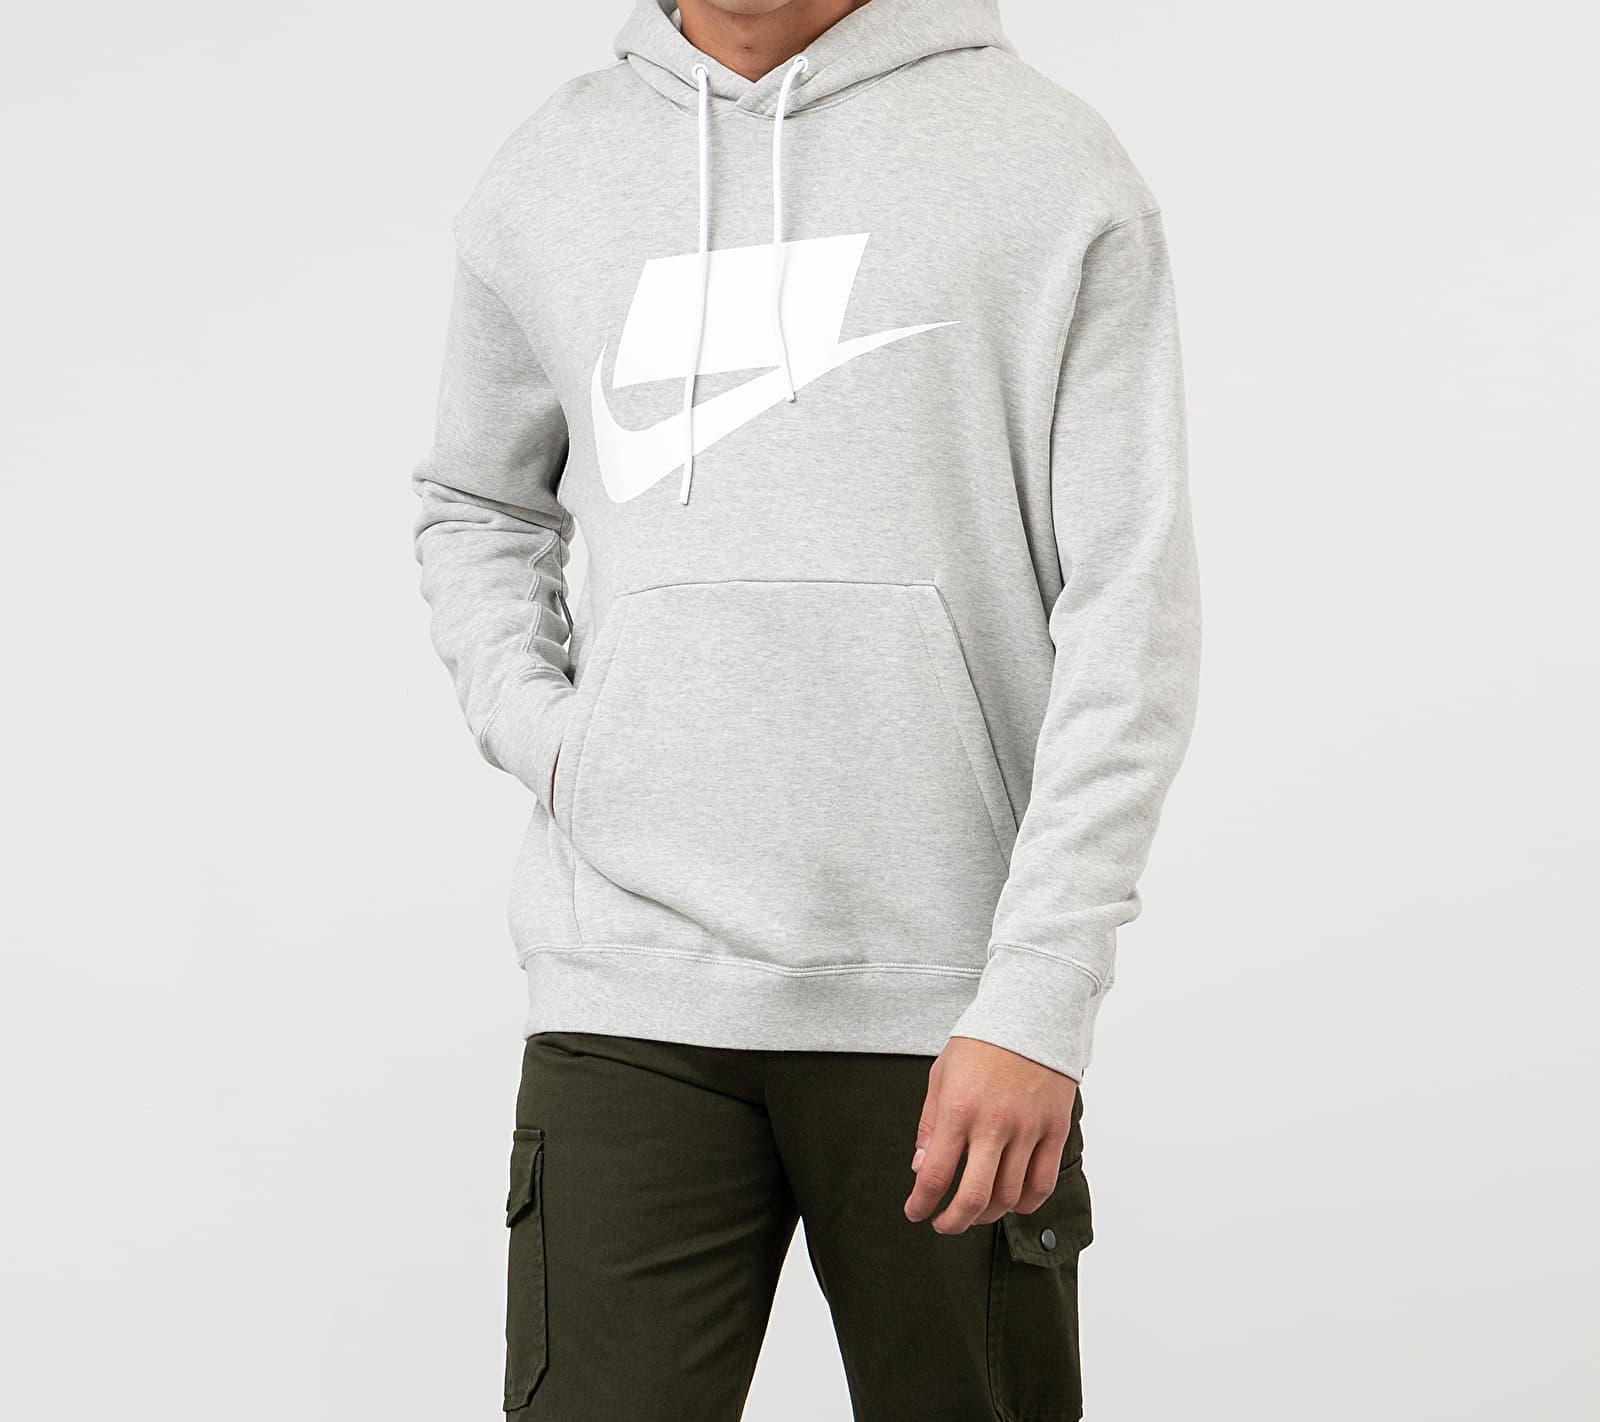 Nike Sportswear NSP Hoodie Grey Heather/ White, Gray